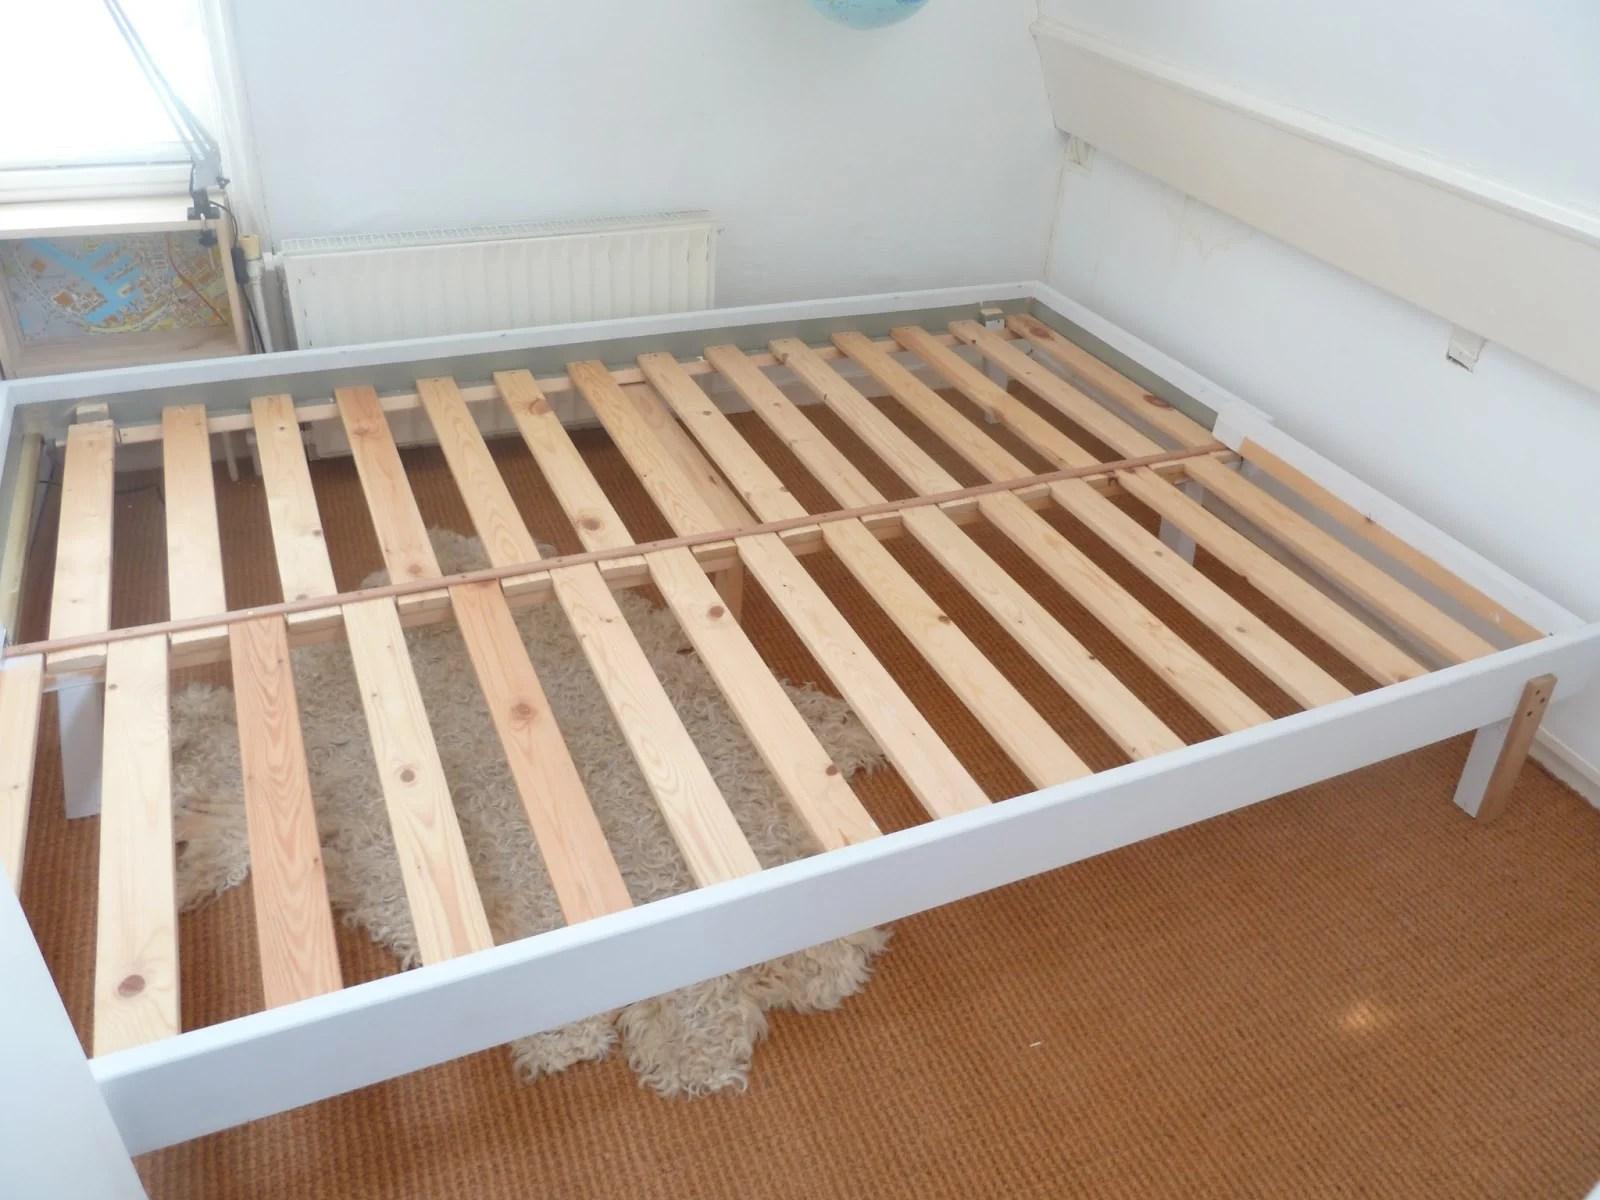 ikea single bed instructions